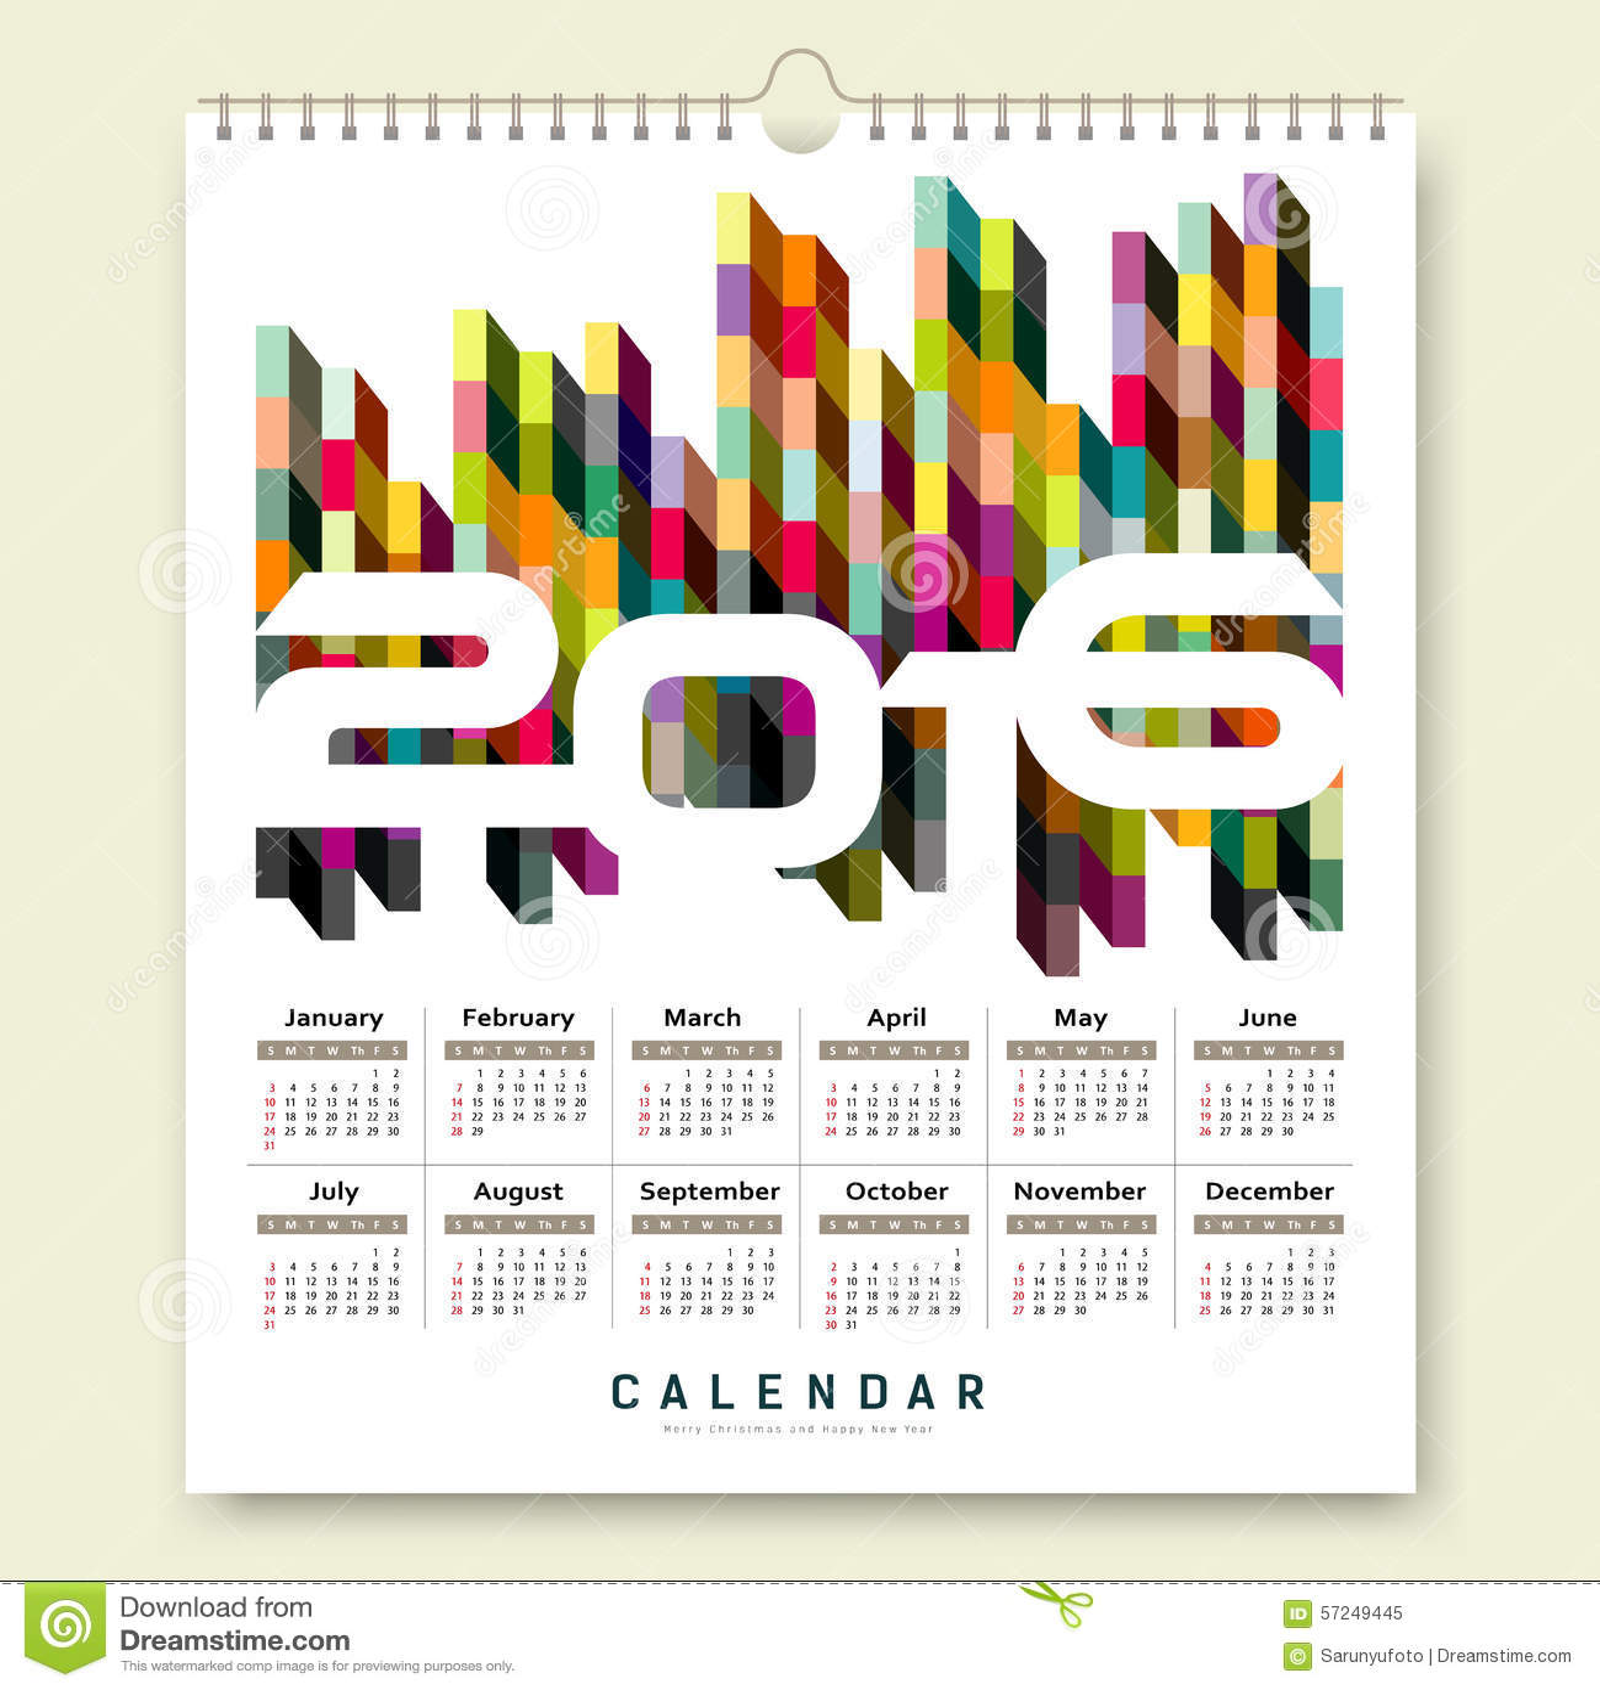 Dise o cuadrado geom trico colorido del calendario 2016 - Disenos de calendarios ...